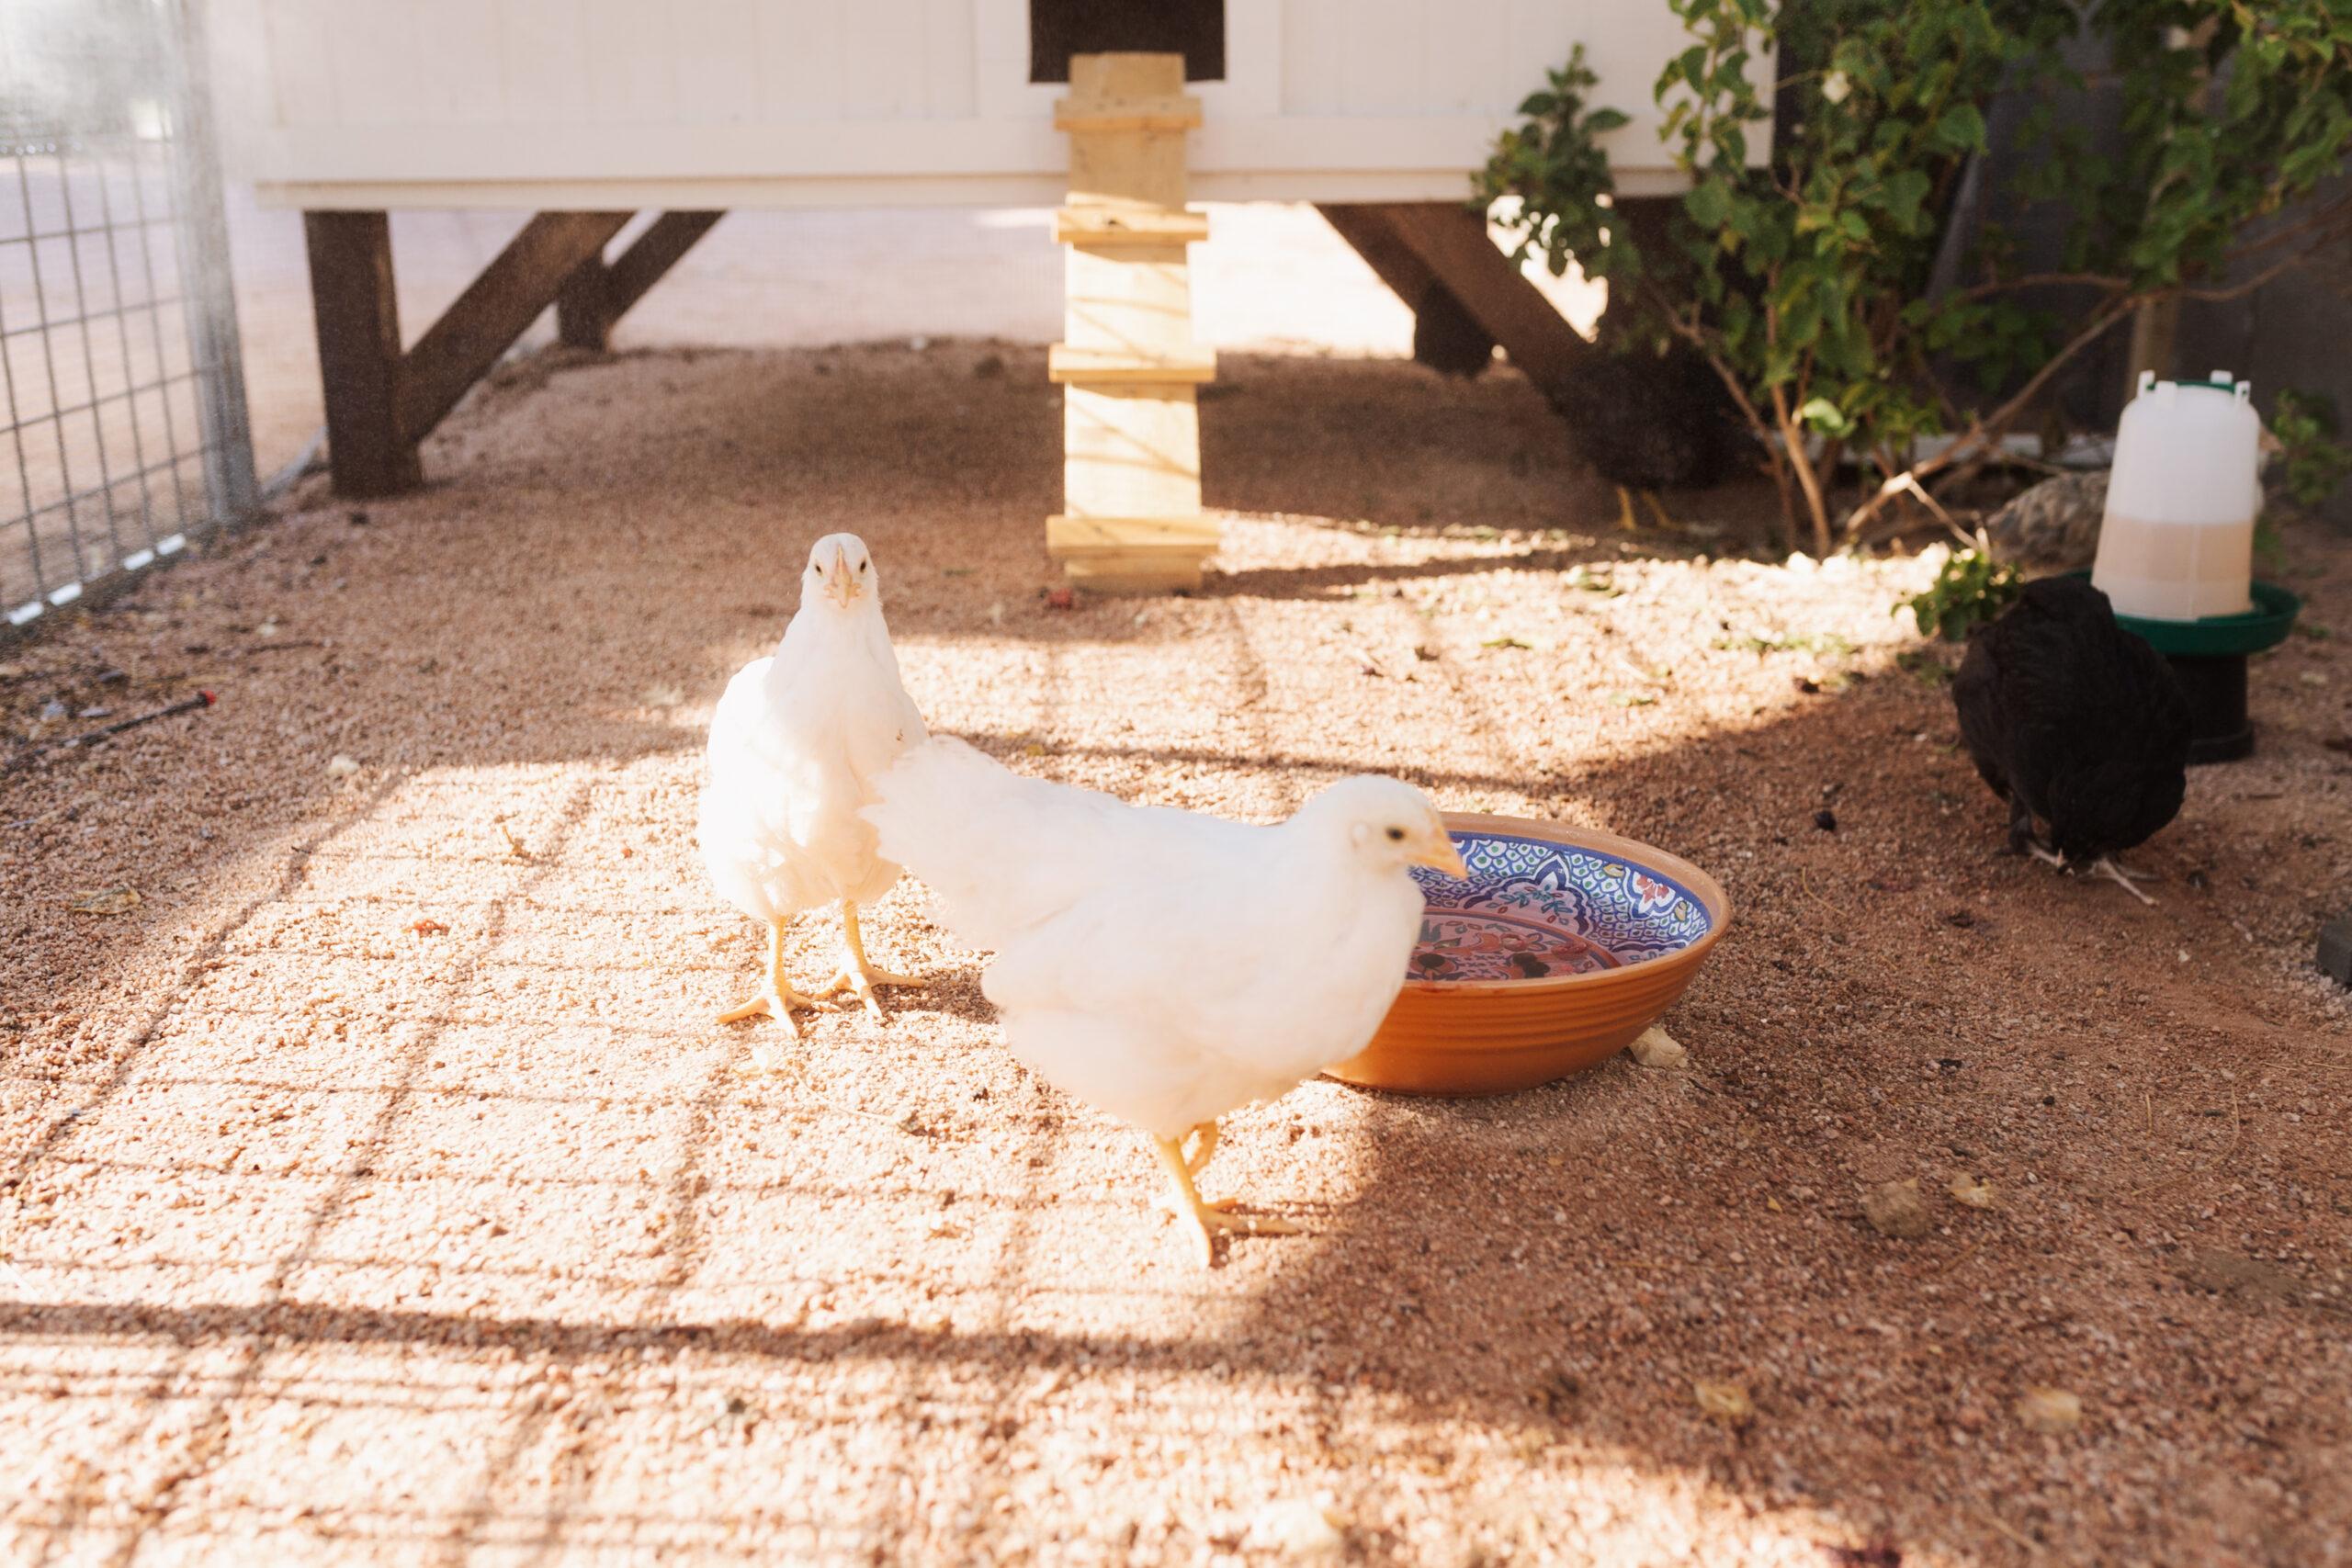 happy chickens in the backyard shaded predator proof chicken run